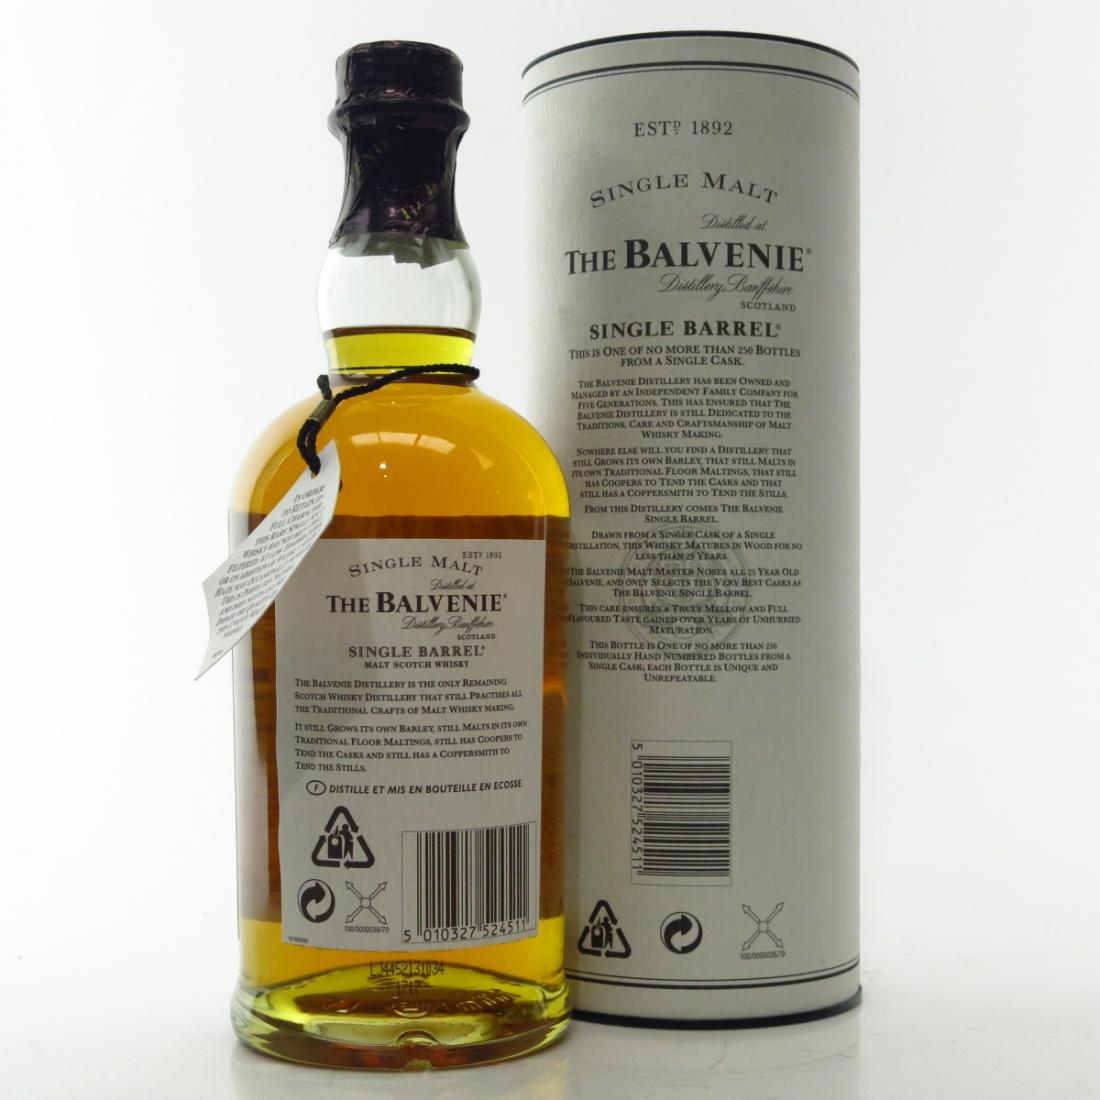 Balvenie 1974 Single Barrel 25 Year Old #14992